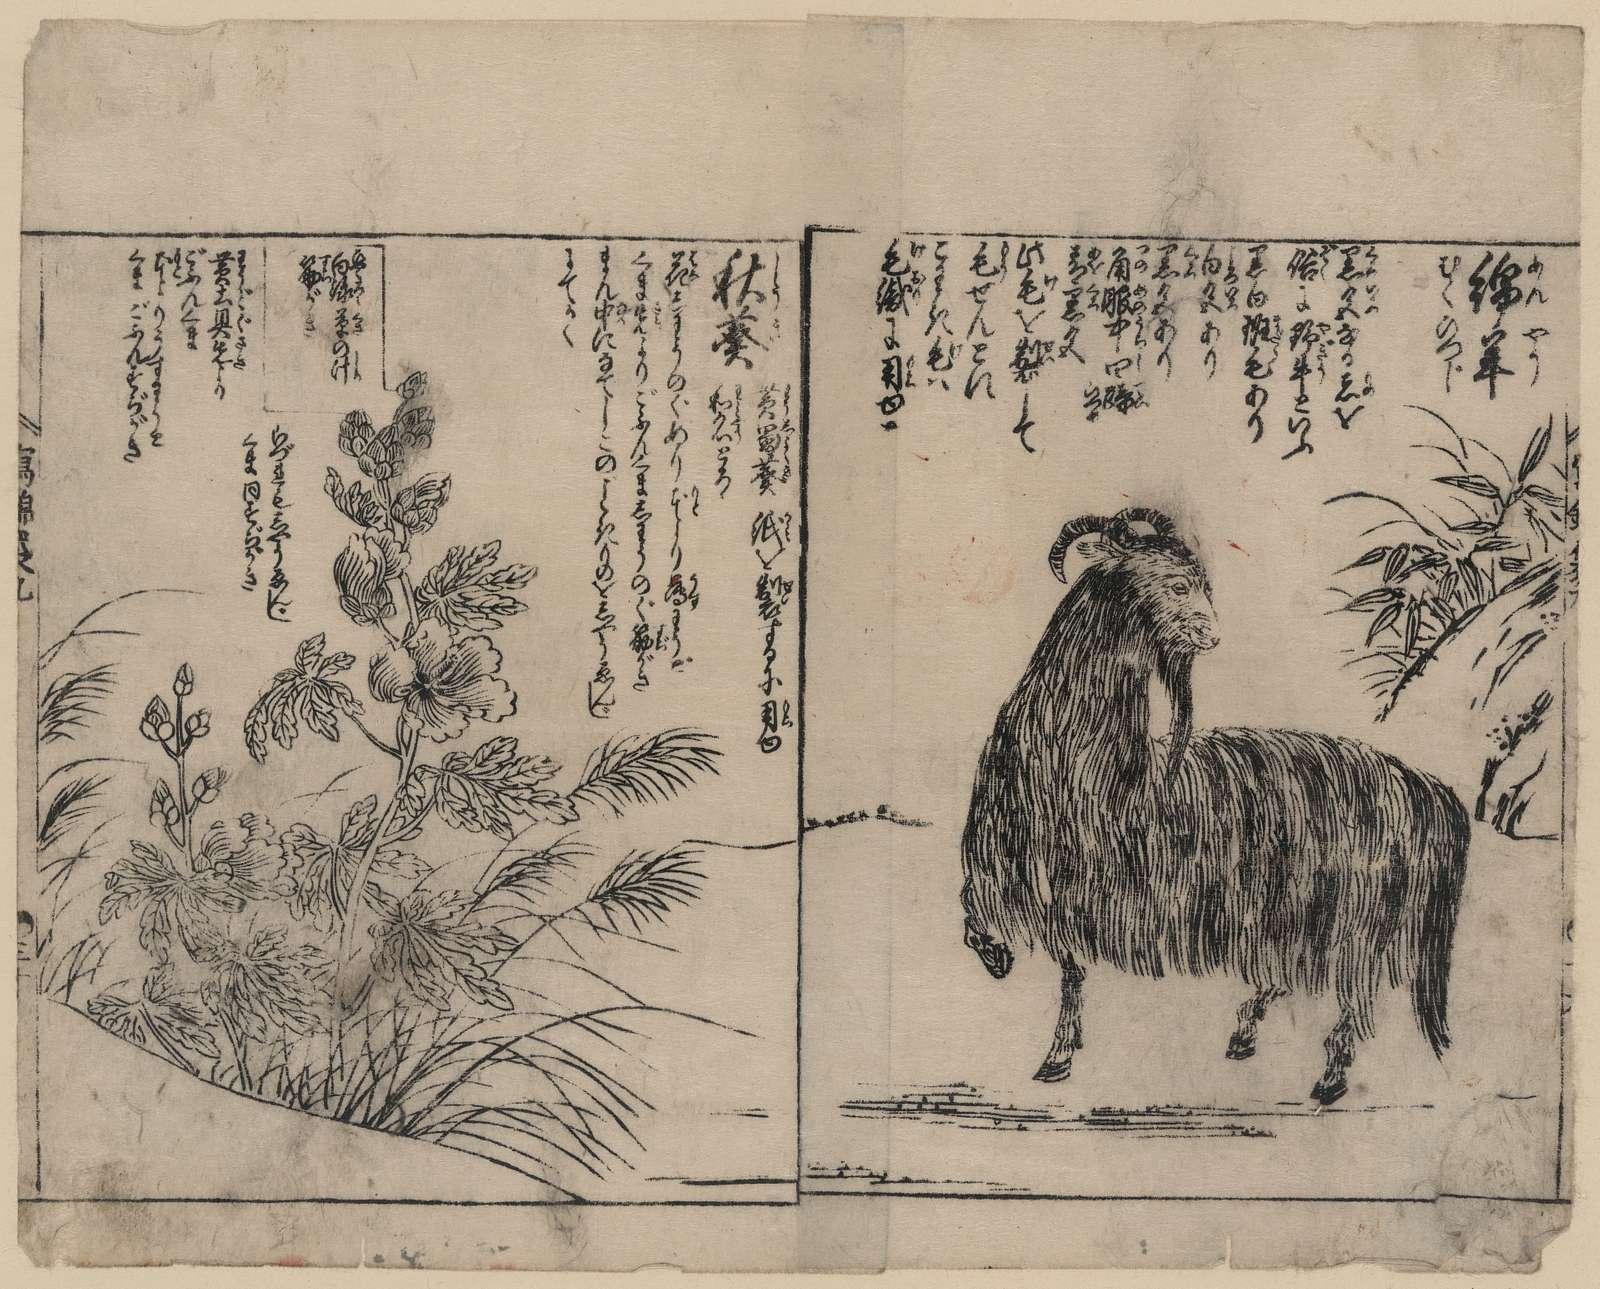 [Ram and autumn mallow]